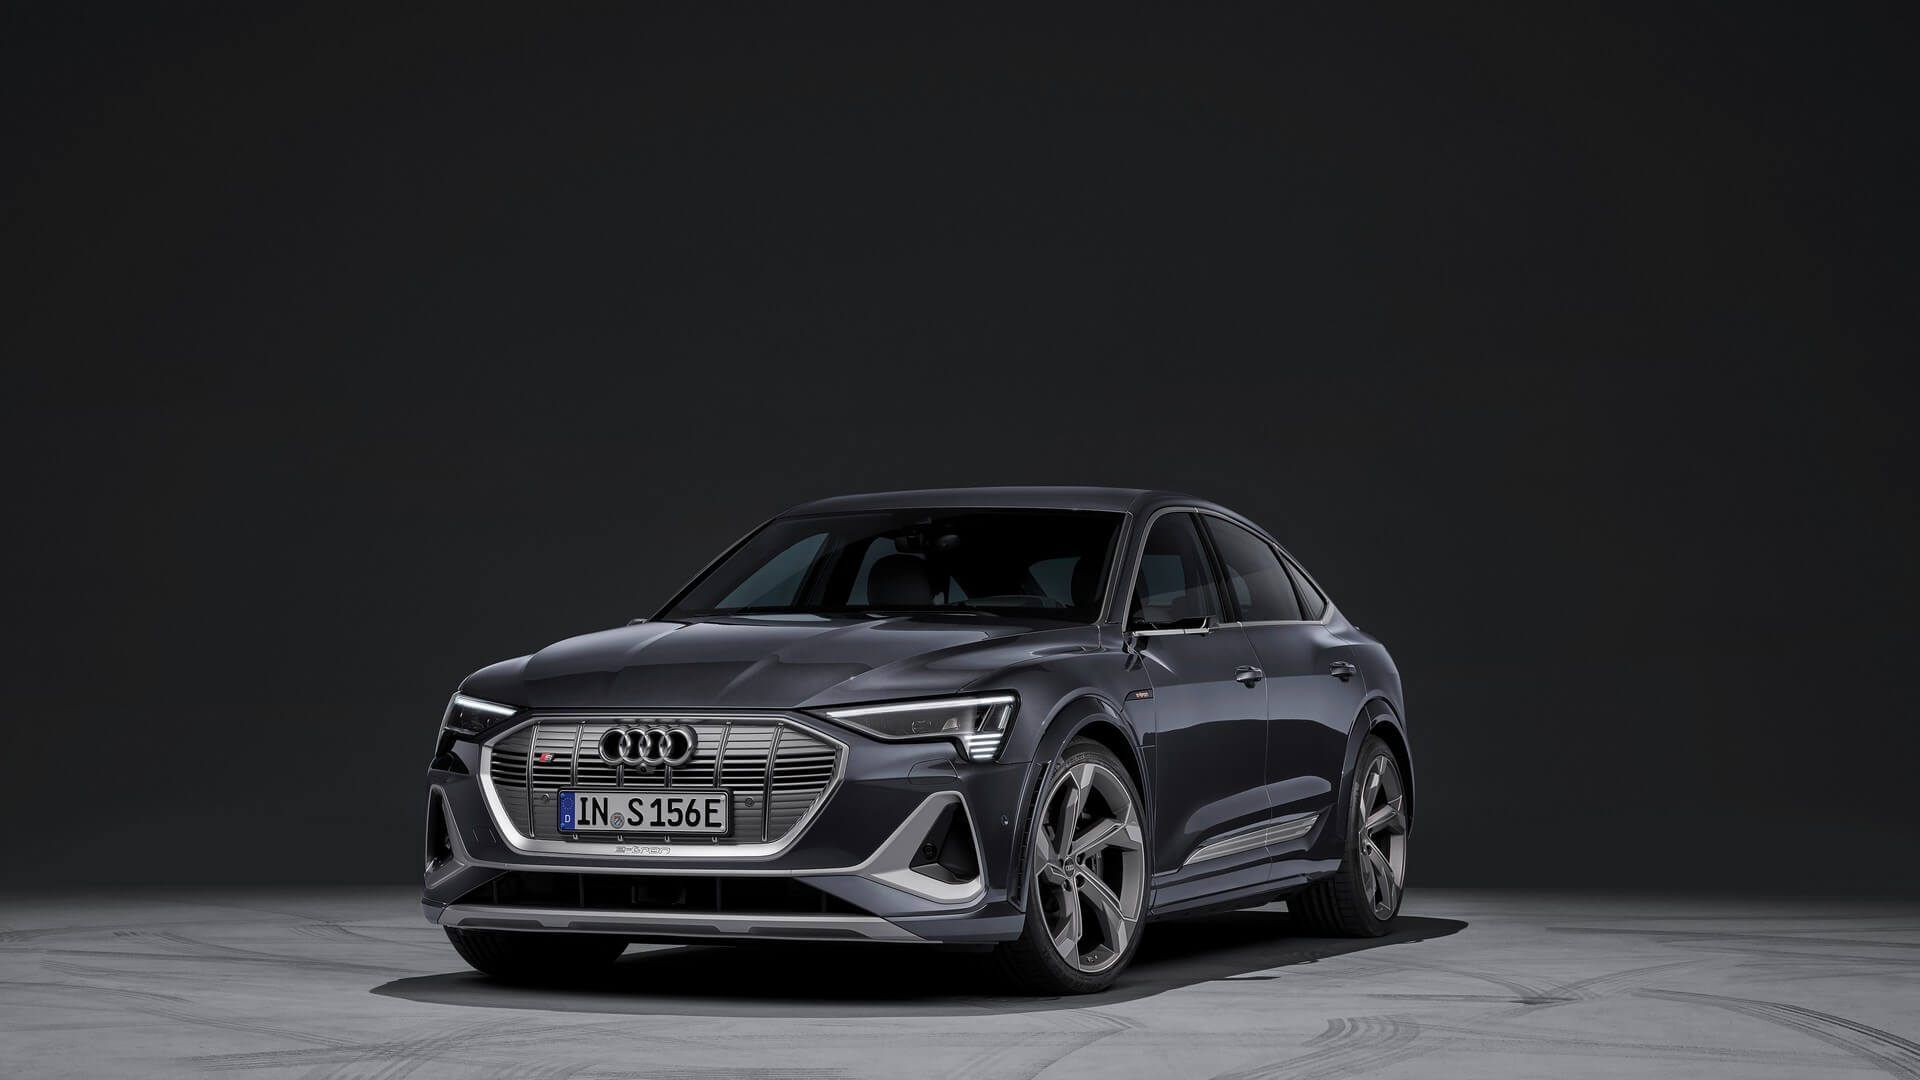 Audi-E-Tron-S-and-E-Tron-S-Sportback-2020-67